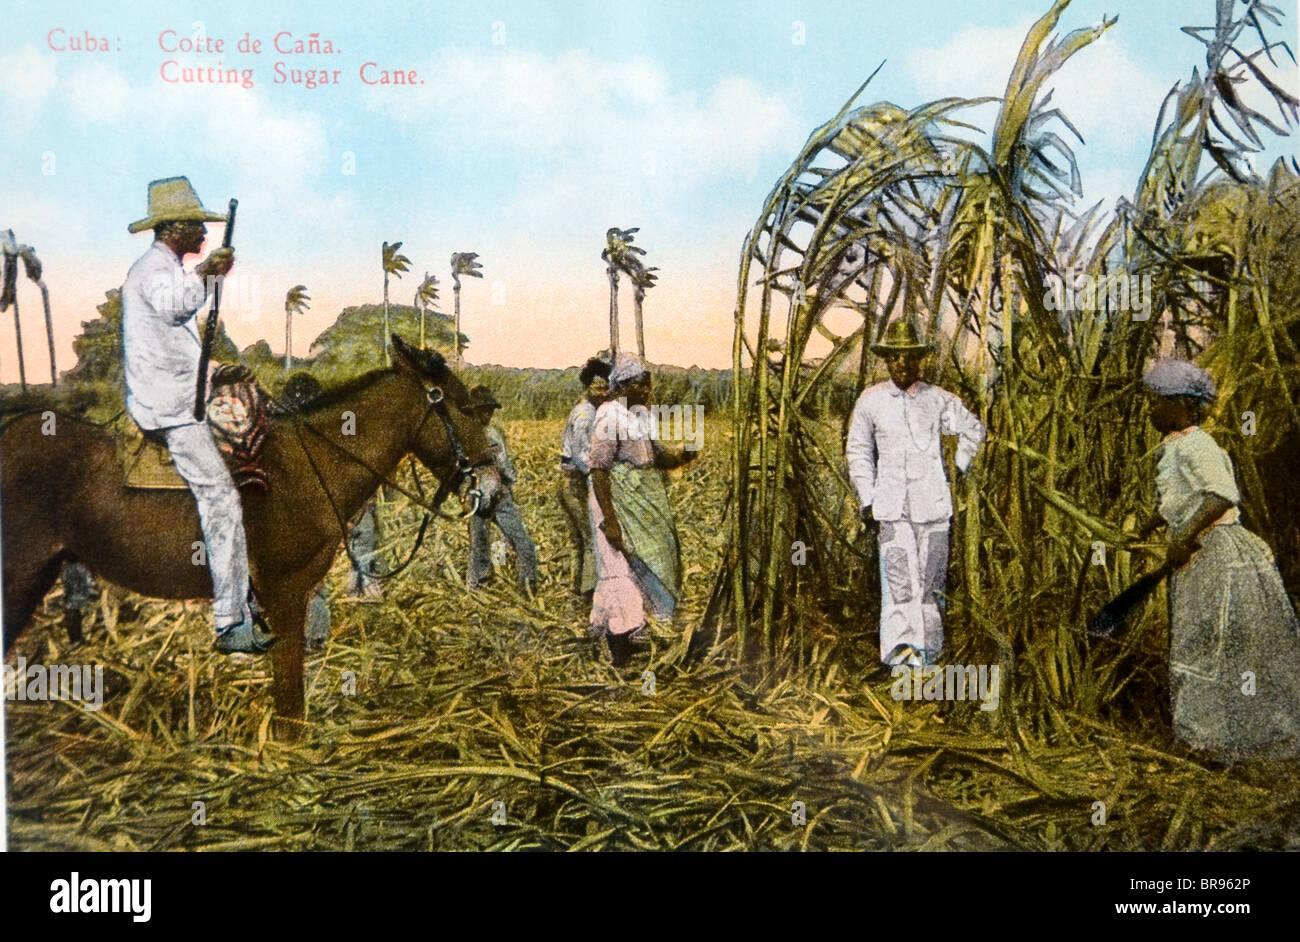 Cuba Cuban Cutting Sugar Cane Painting 1930 - Stock Image